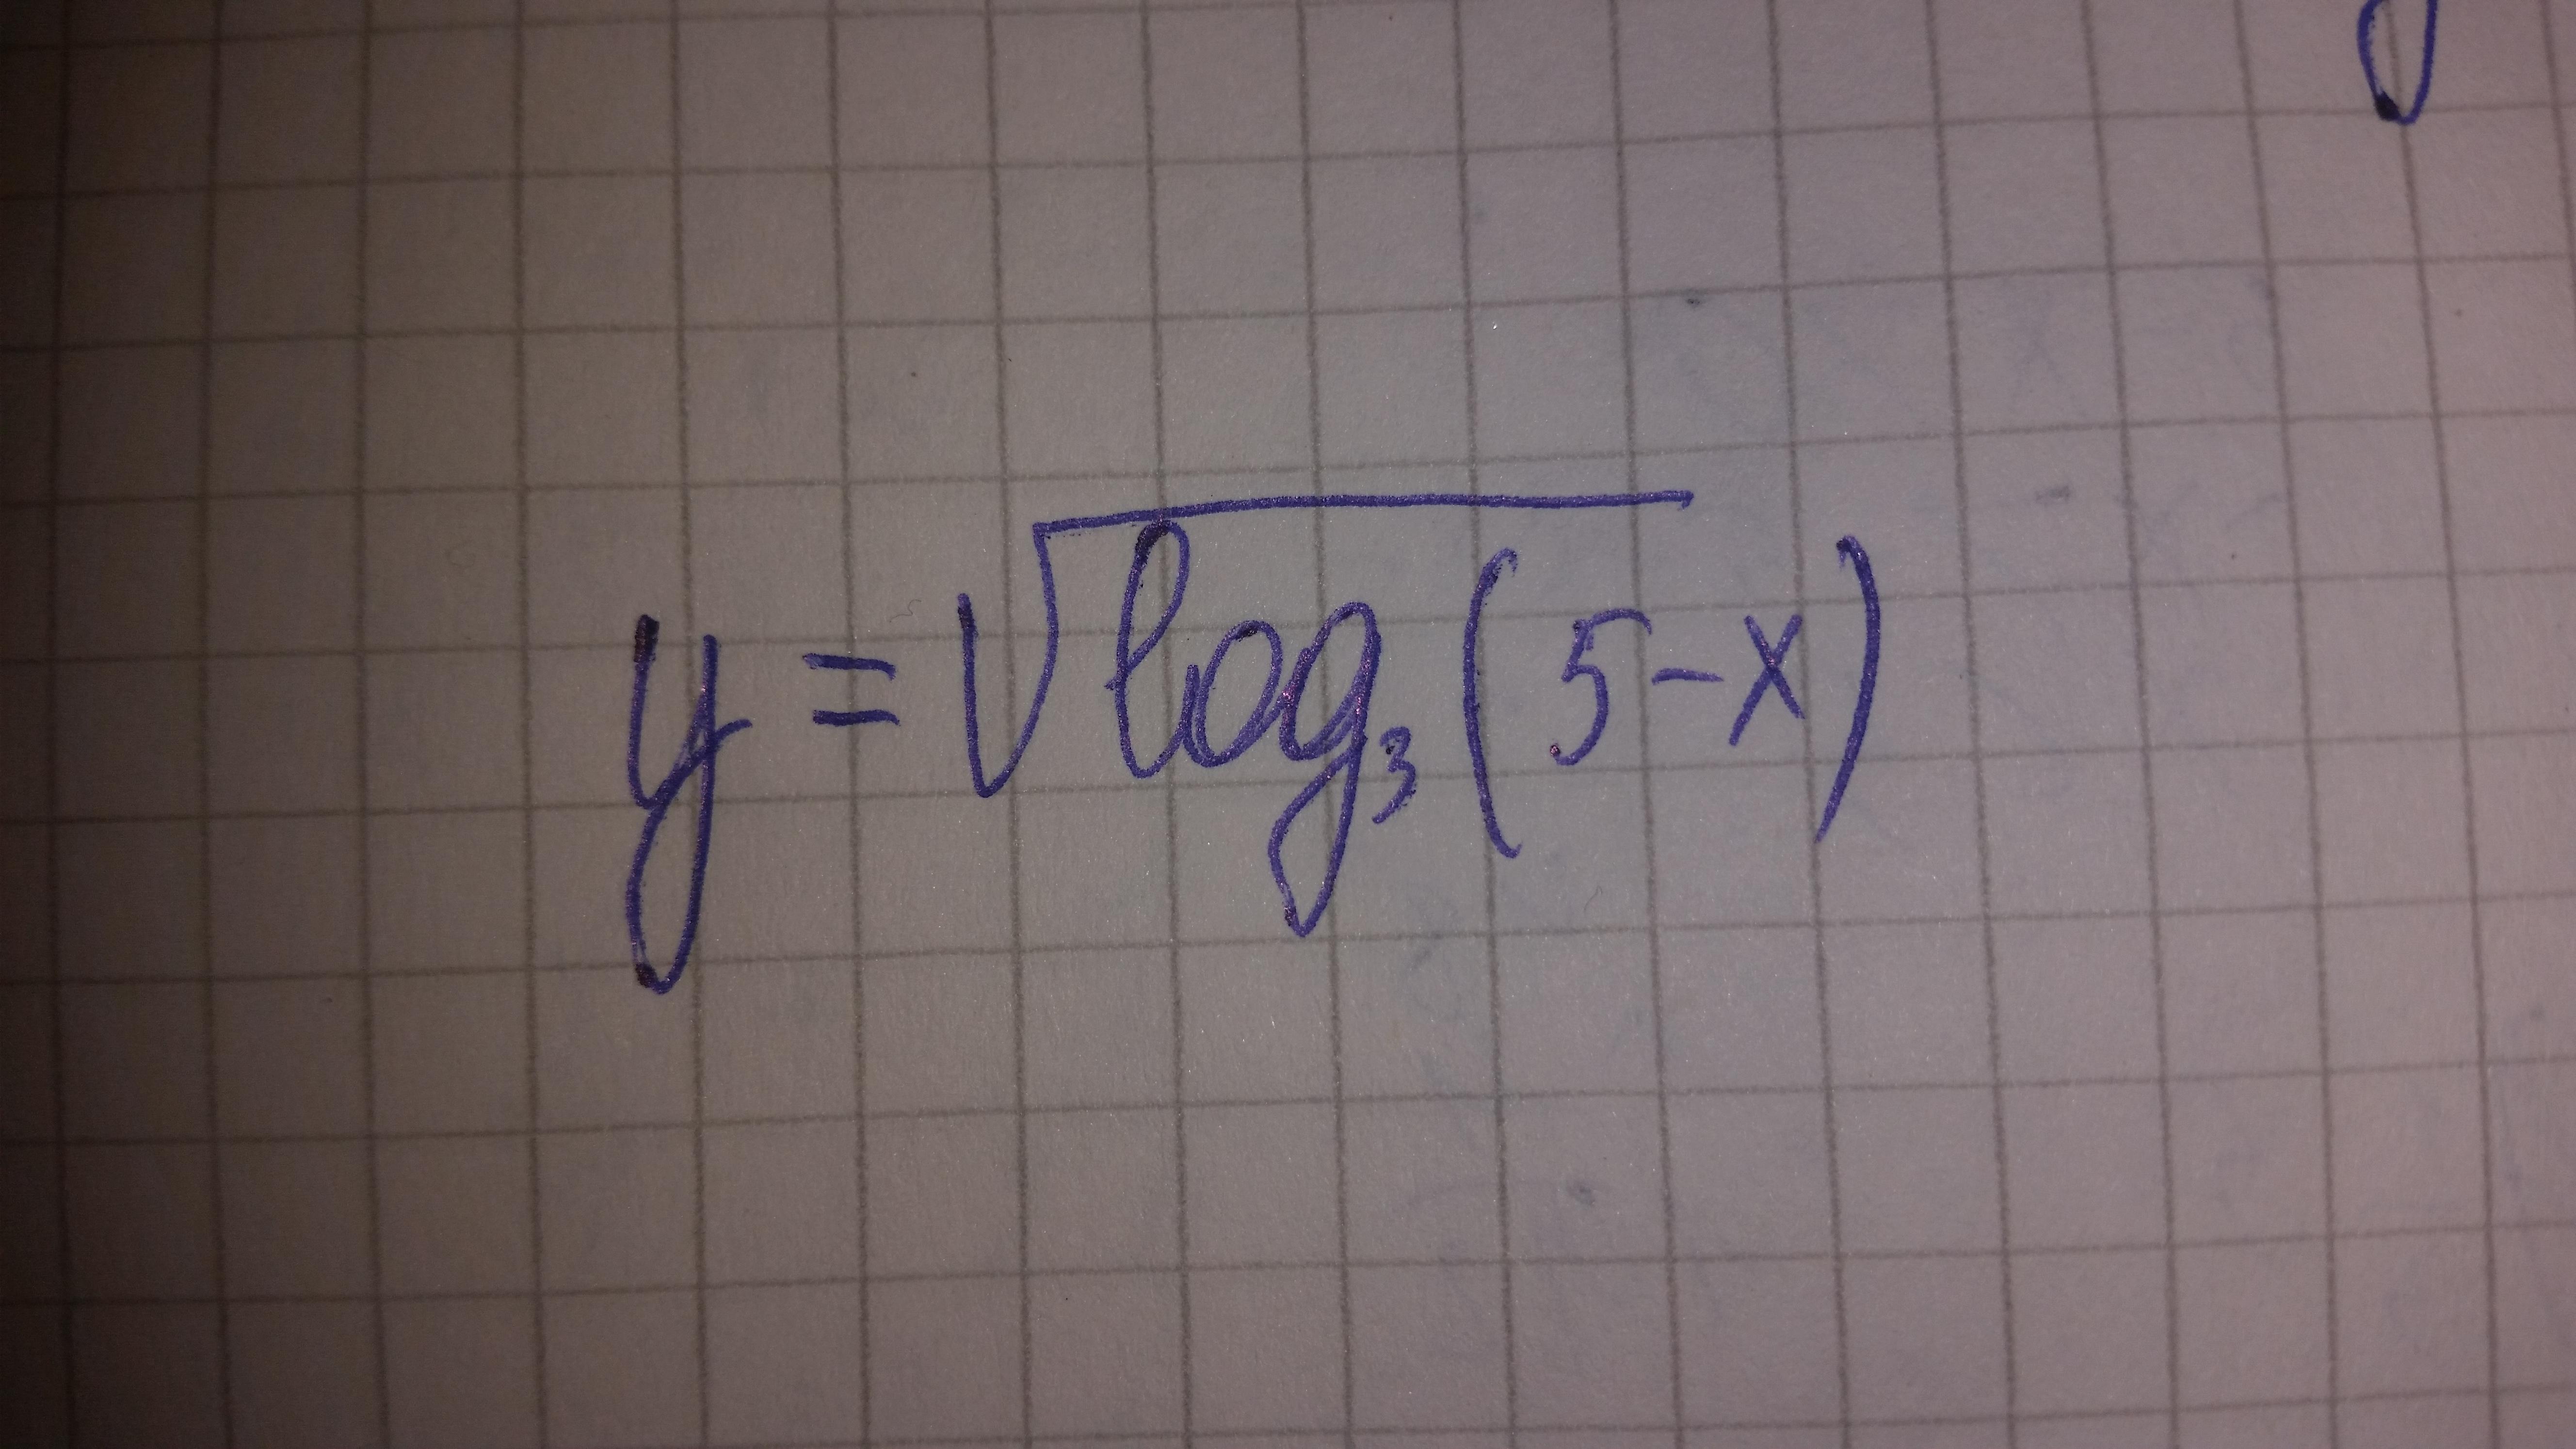 Найти область определения функции, логарифма, спасибо?